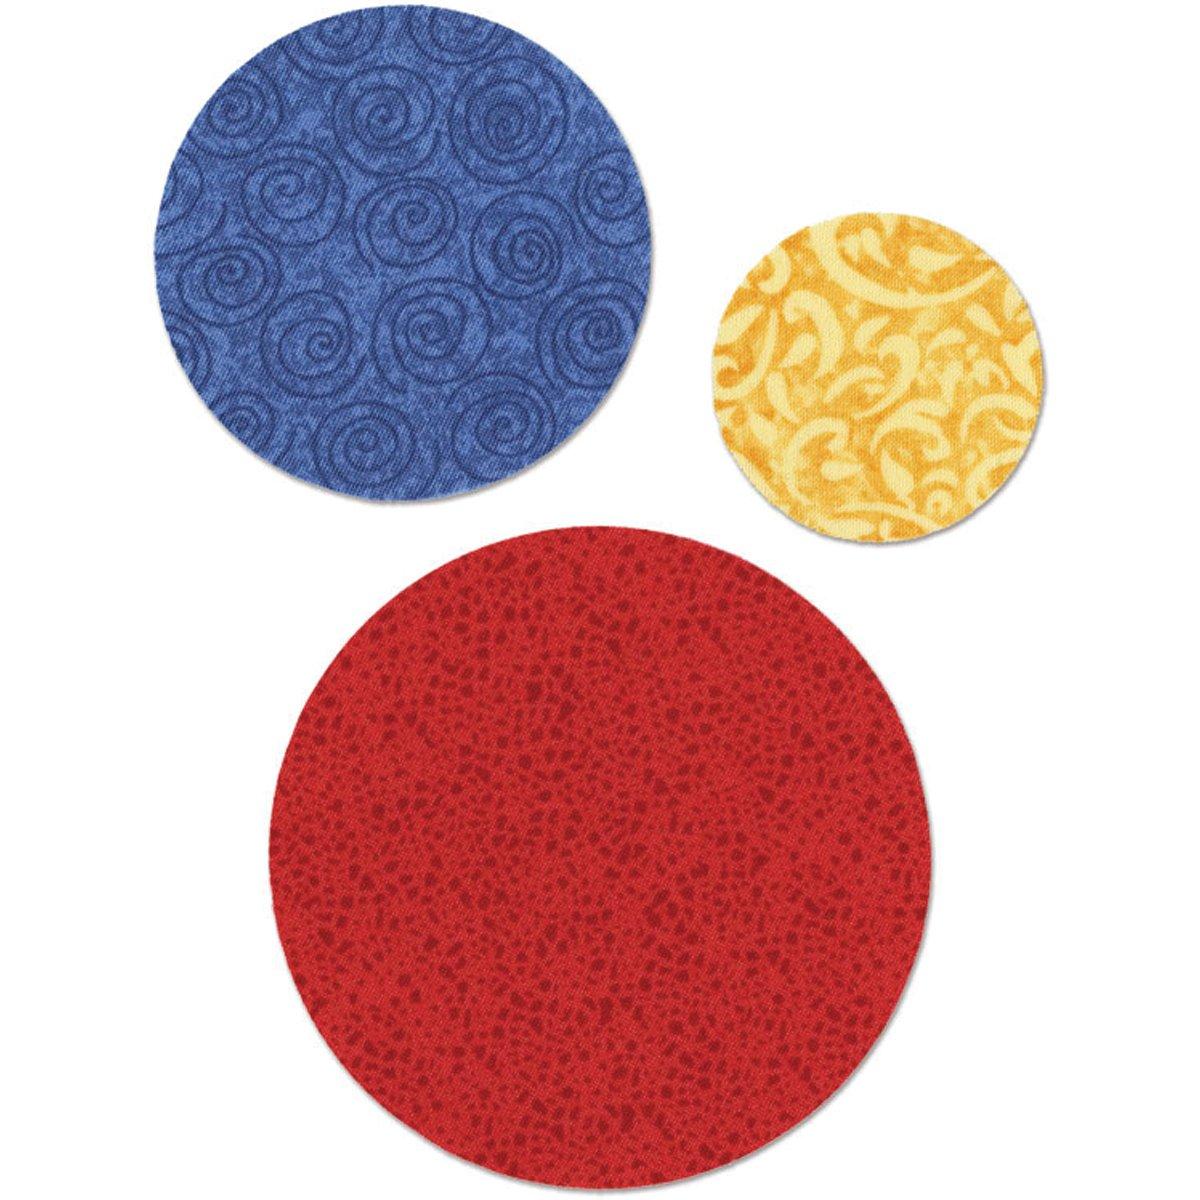 2-Inch 4-Inch Sizzix Circle Bigz Dies Series 3-Inch